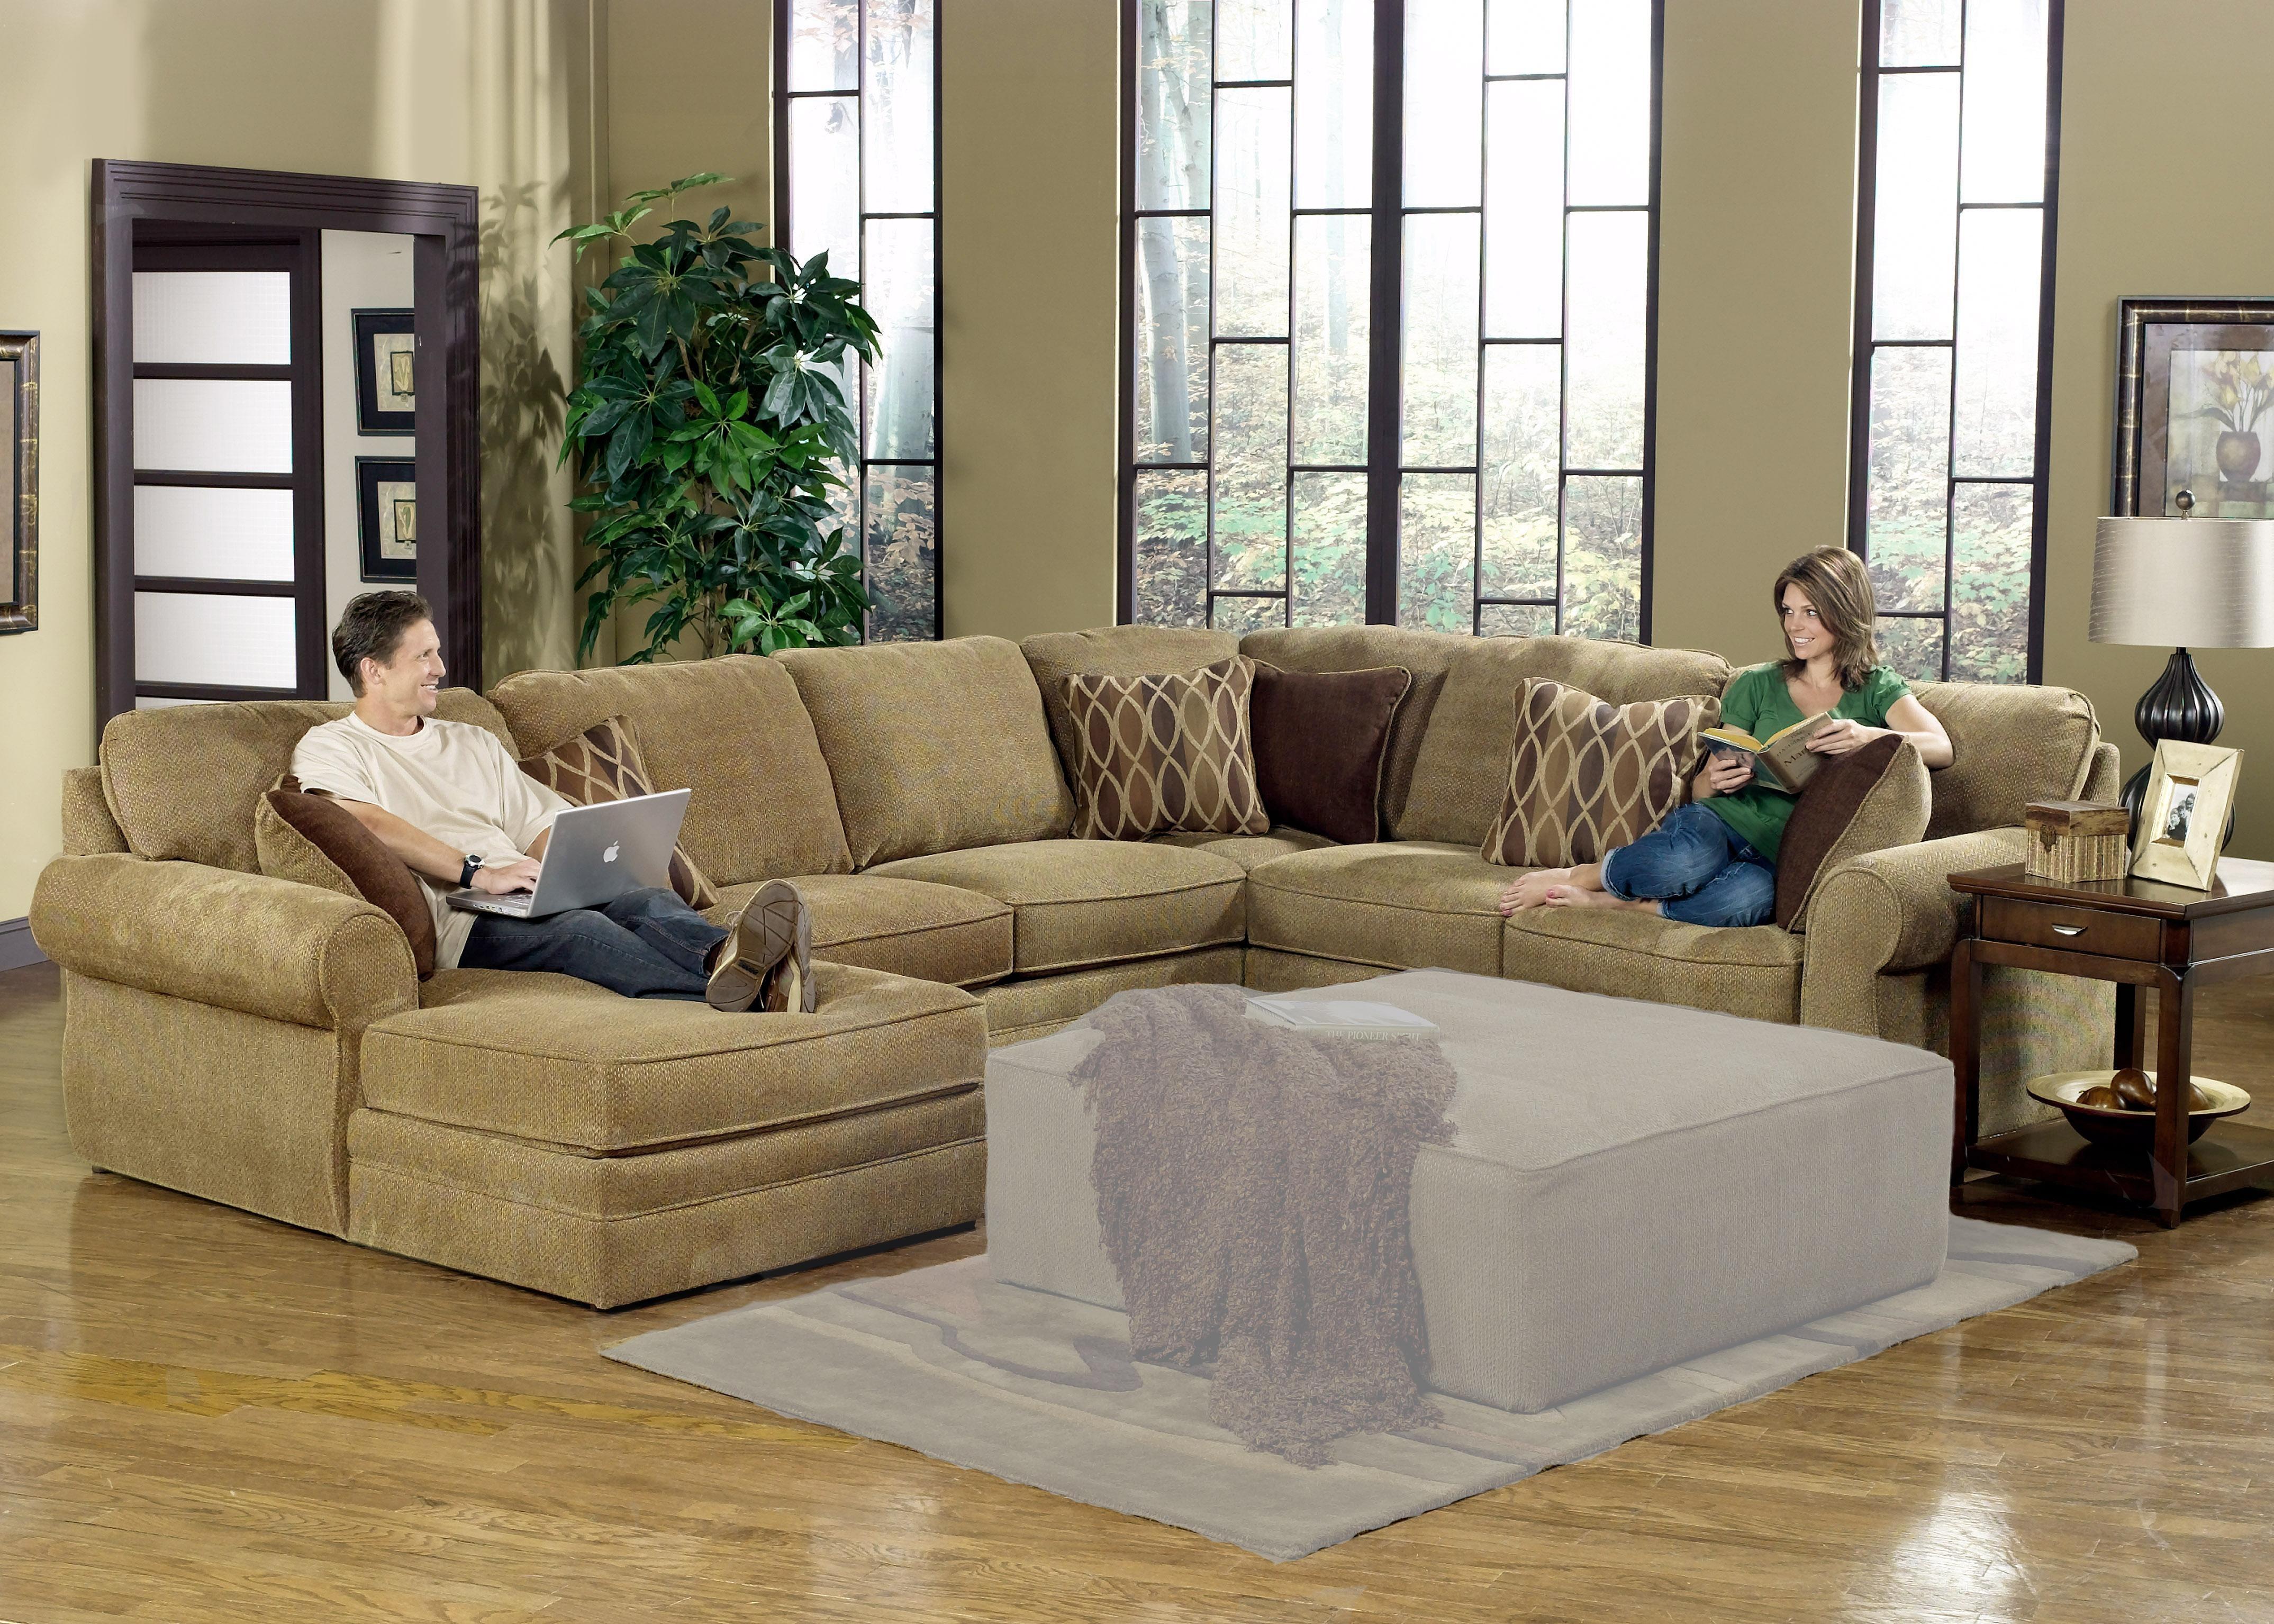 Sectional Sofa Design: Adorable Large U Shaped Sectional Sofa U In Big U Shaped Sectionals (Image 6 of 10)